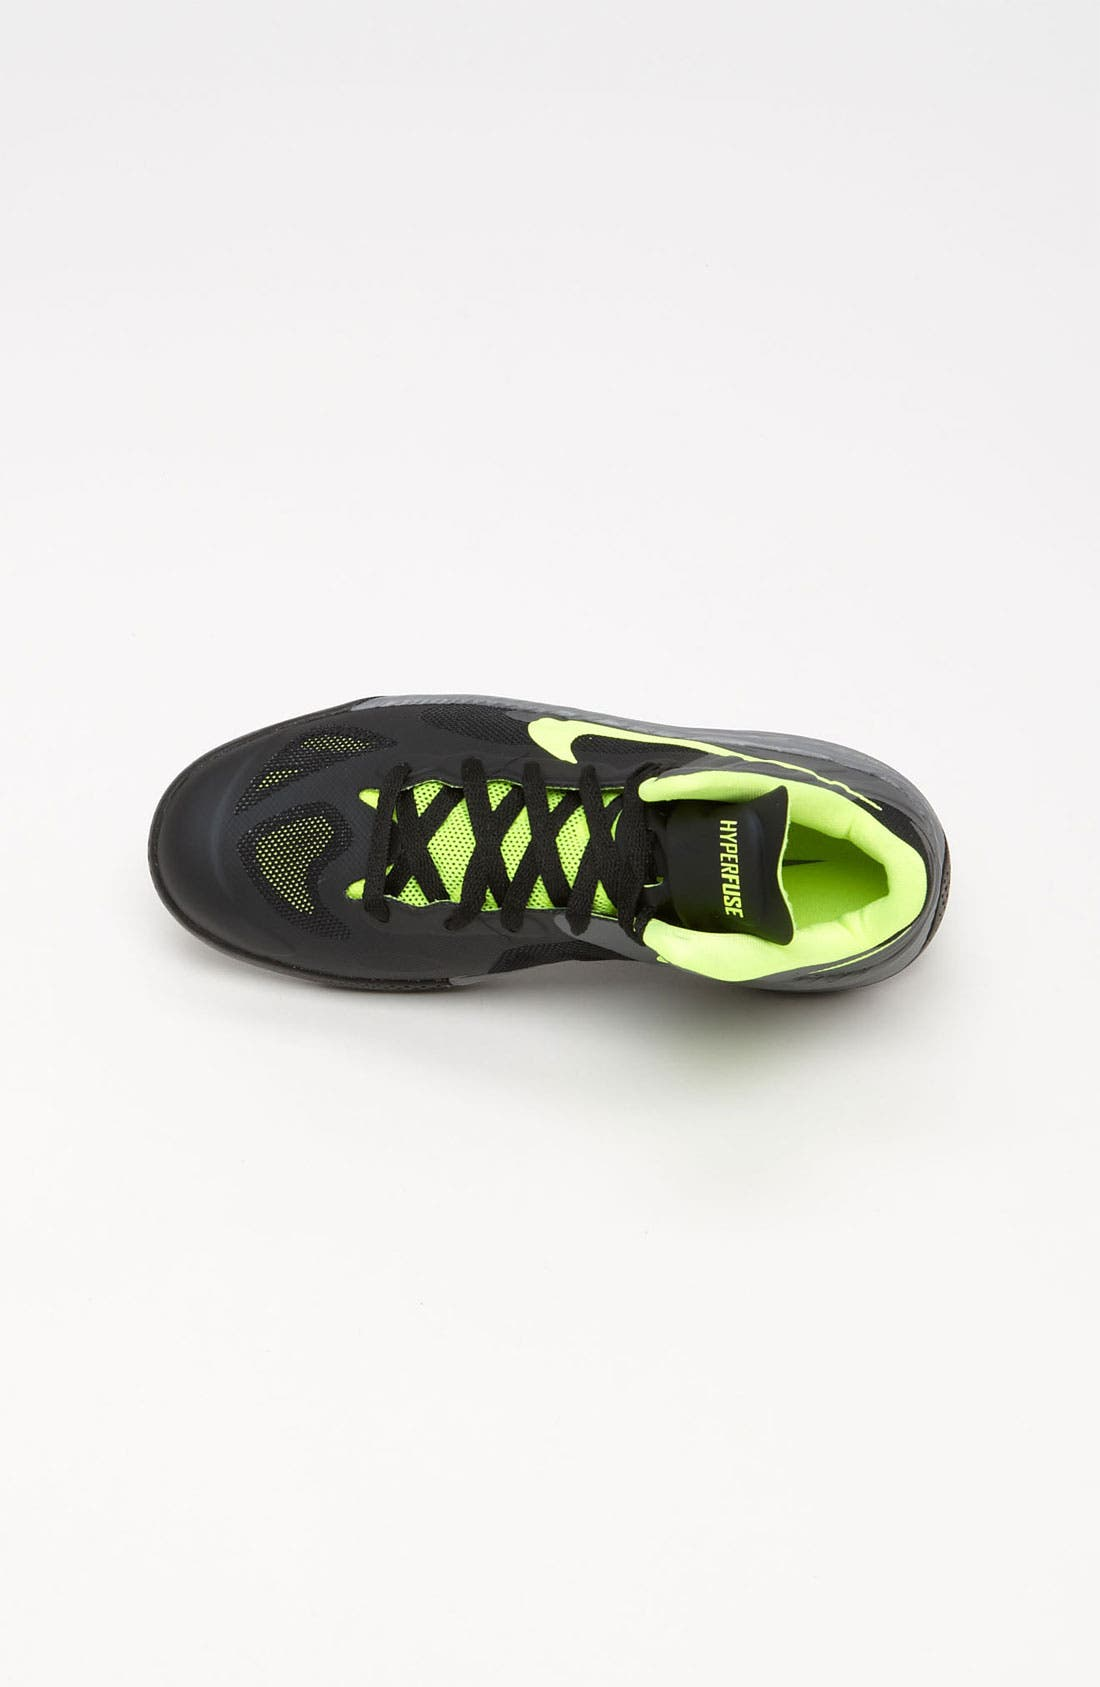 Alternate Image 3  - Nike 'Hyperfuse 2012' Basketball Shoe (Big Kid)